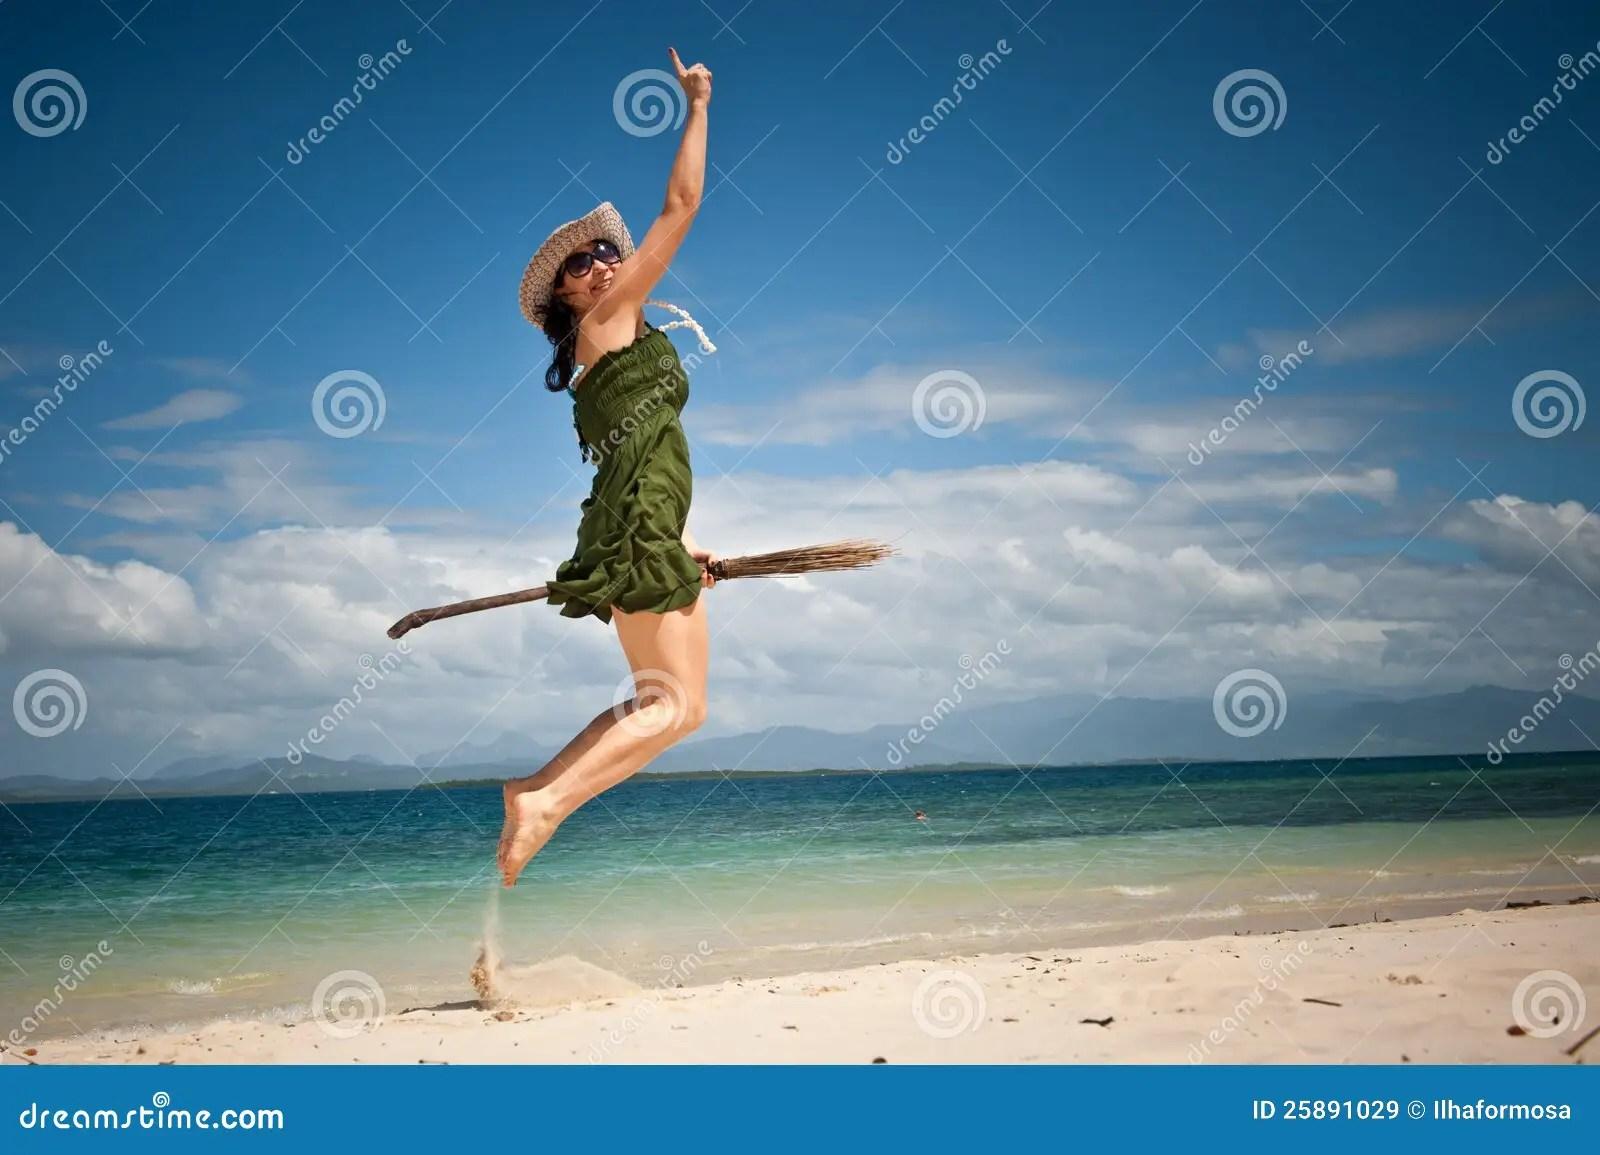 2 Asian Girls Wallpaper Drawing Creative Girl Happy Jump At Tropical Beach Royalty Free